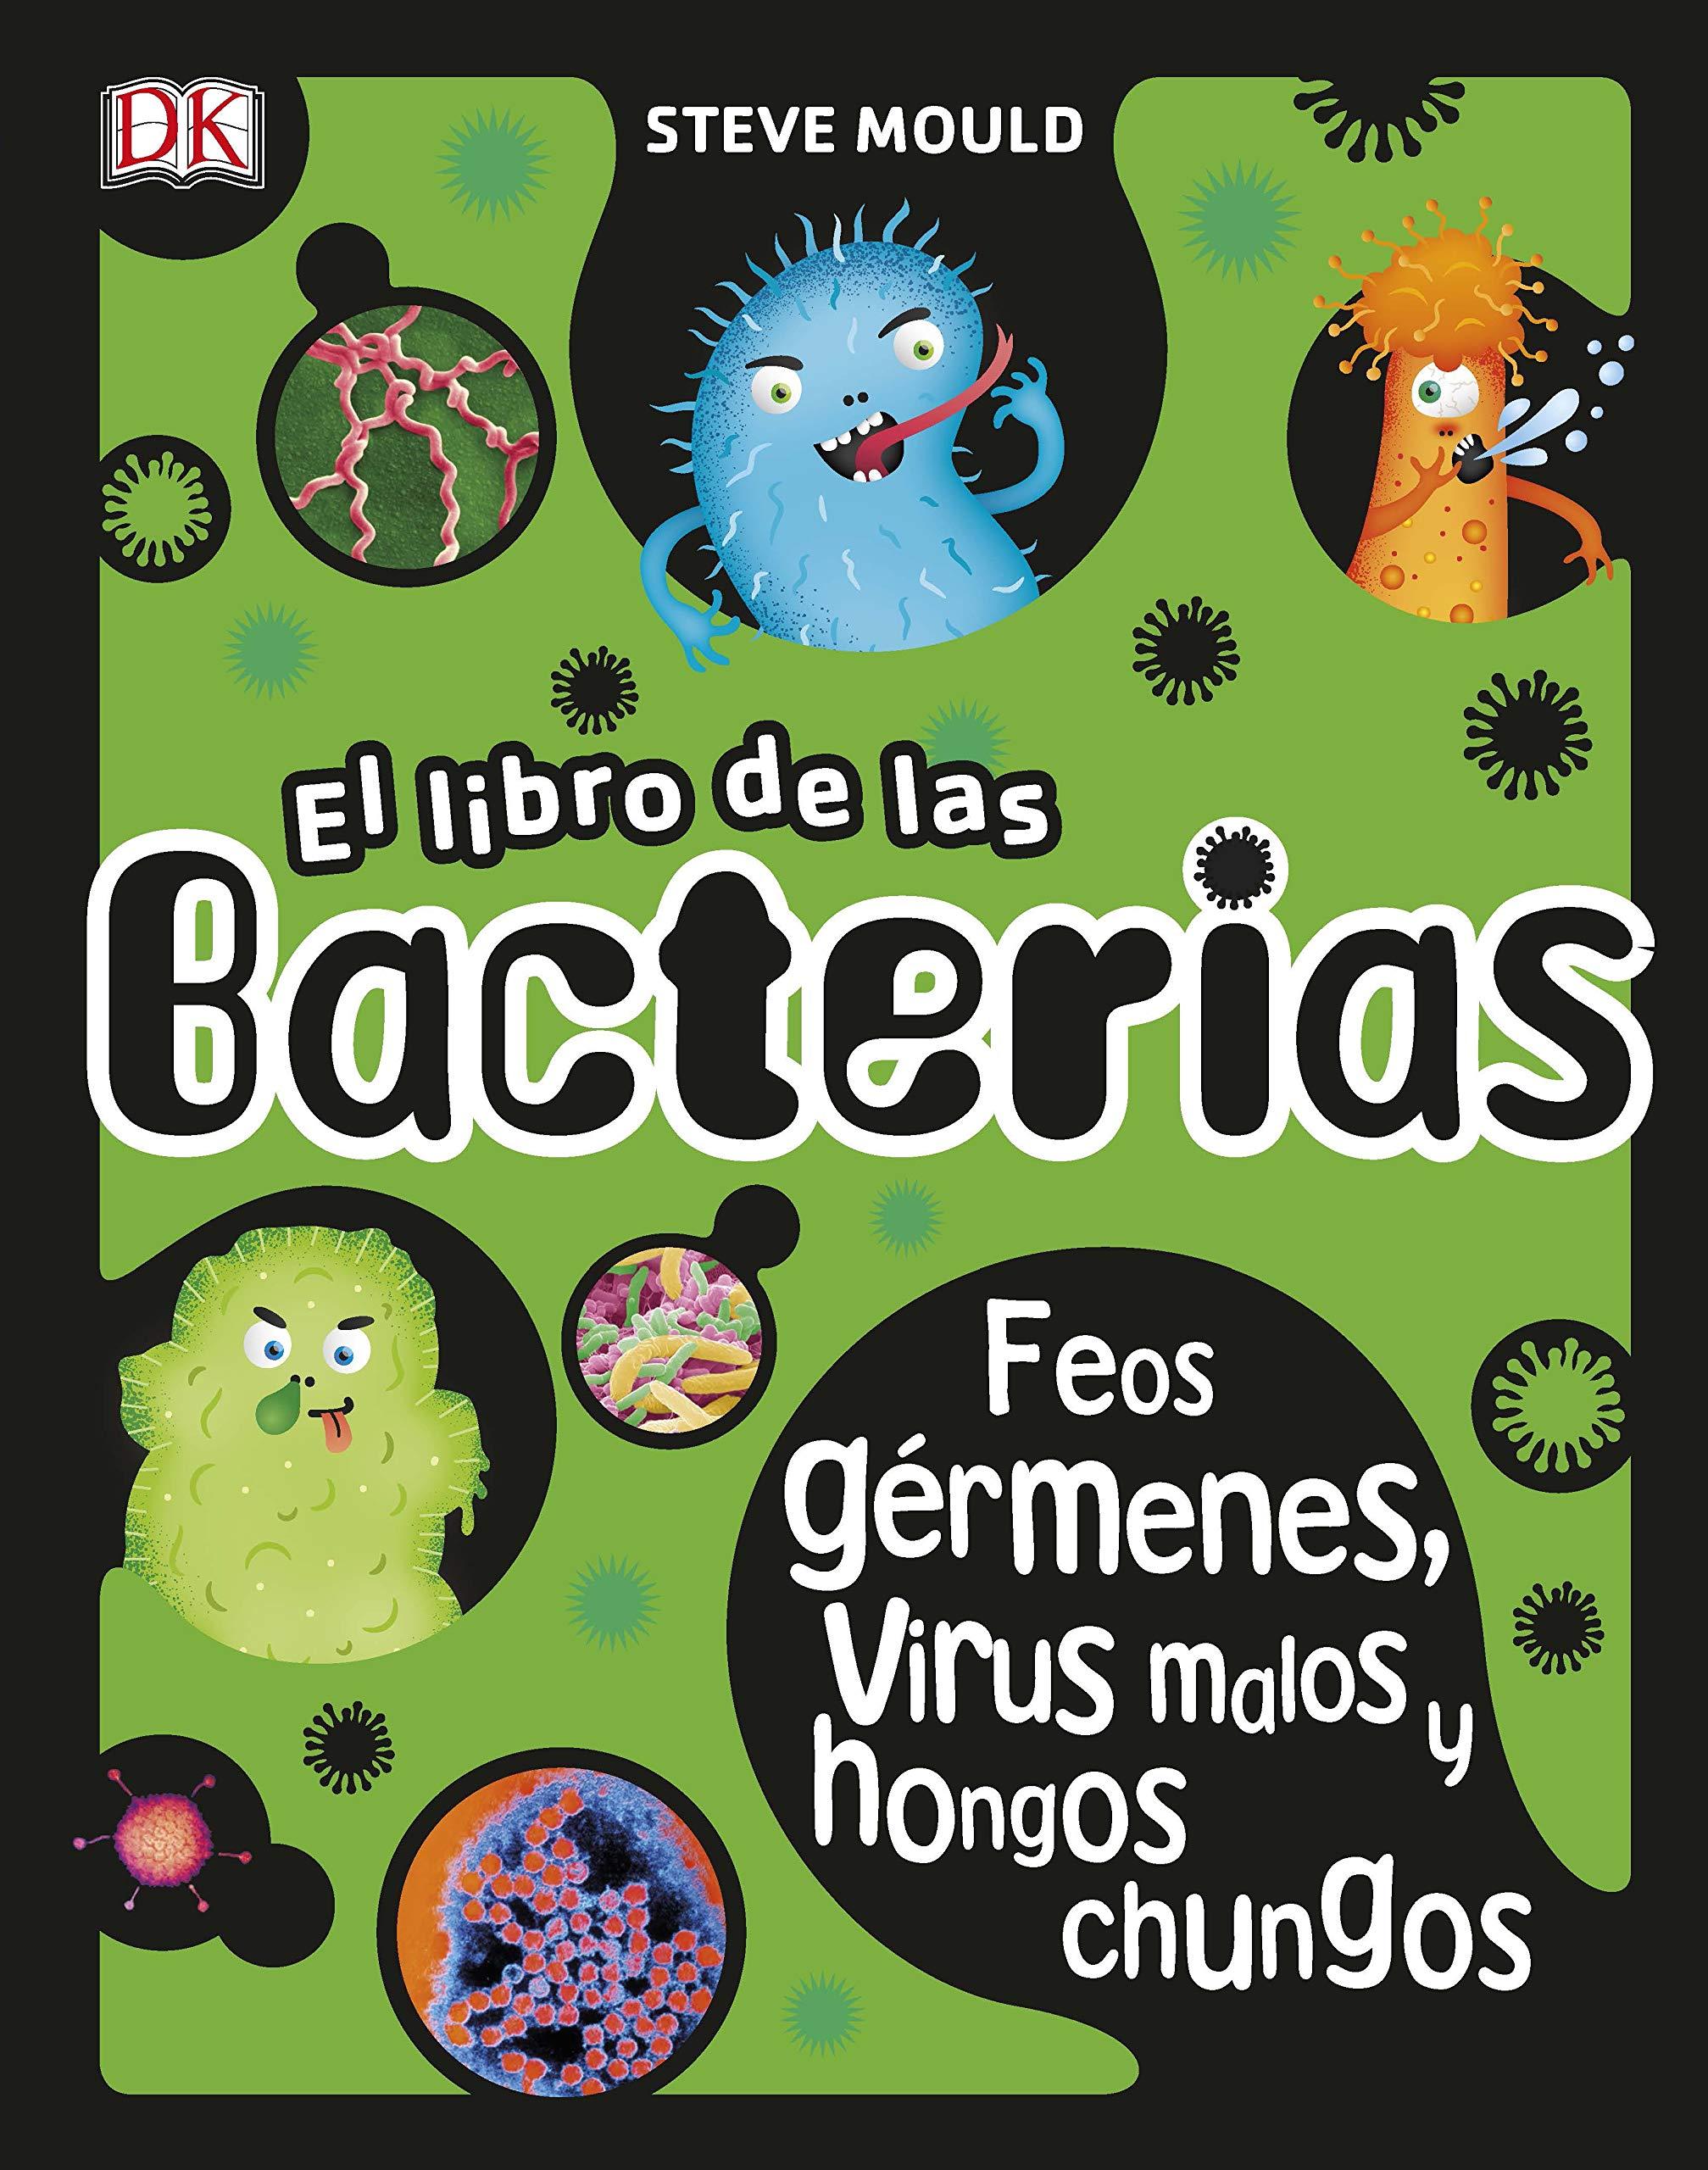 gérmenes del virus